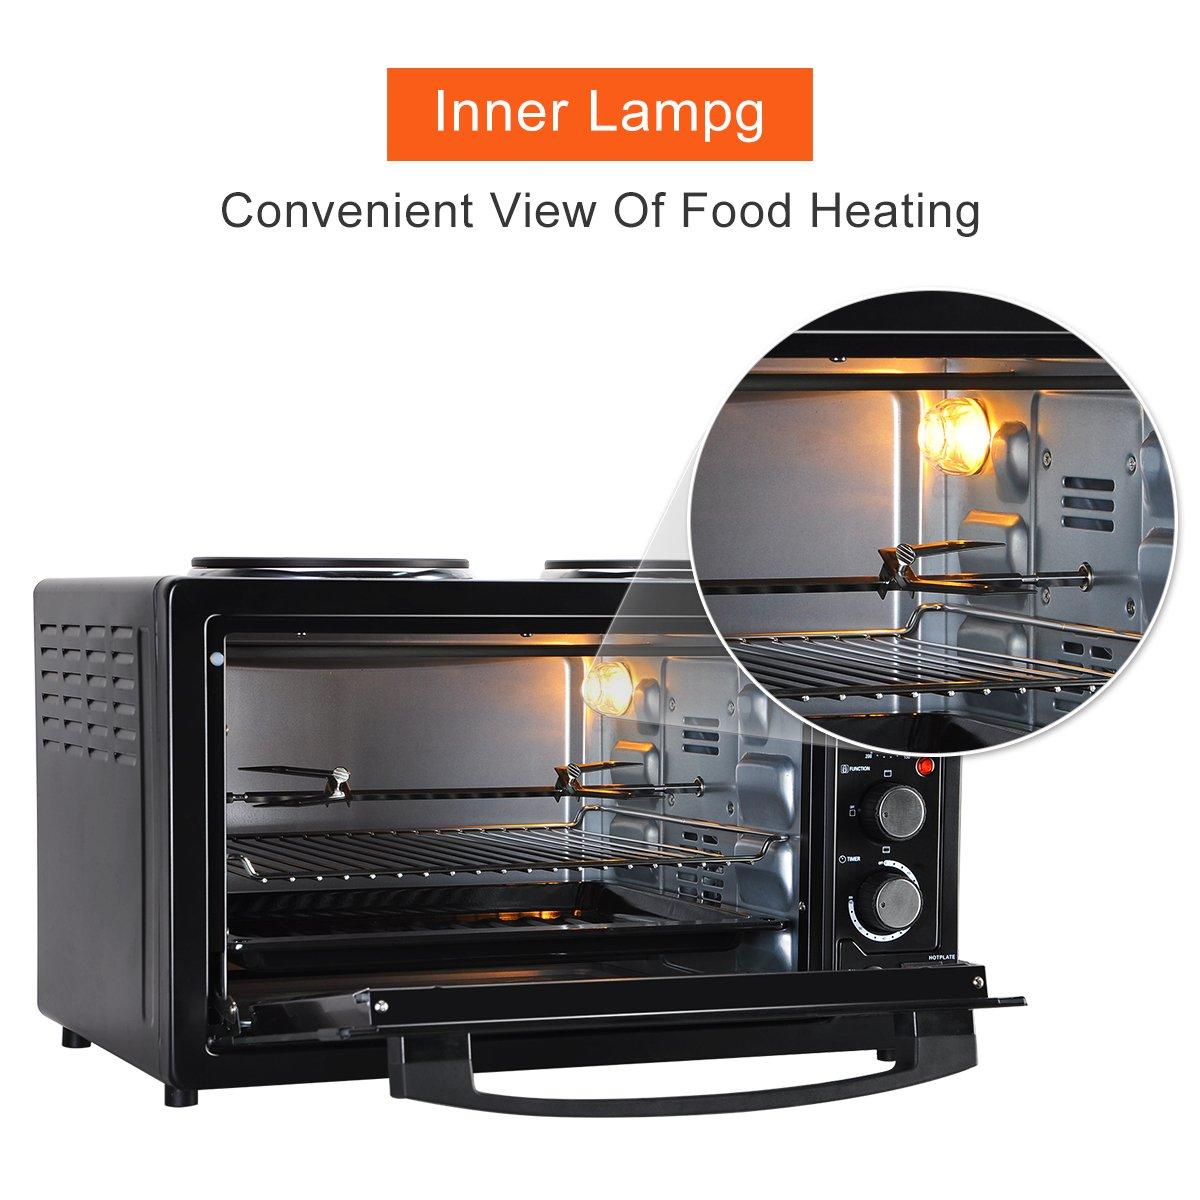 Großartig 220v Verkabelung 4 Draht Ofen Fotos - Elektrische ...